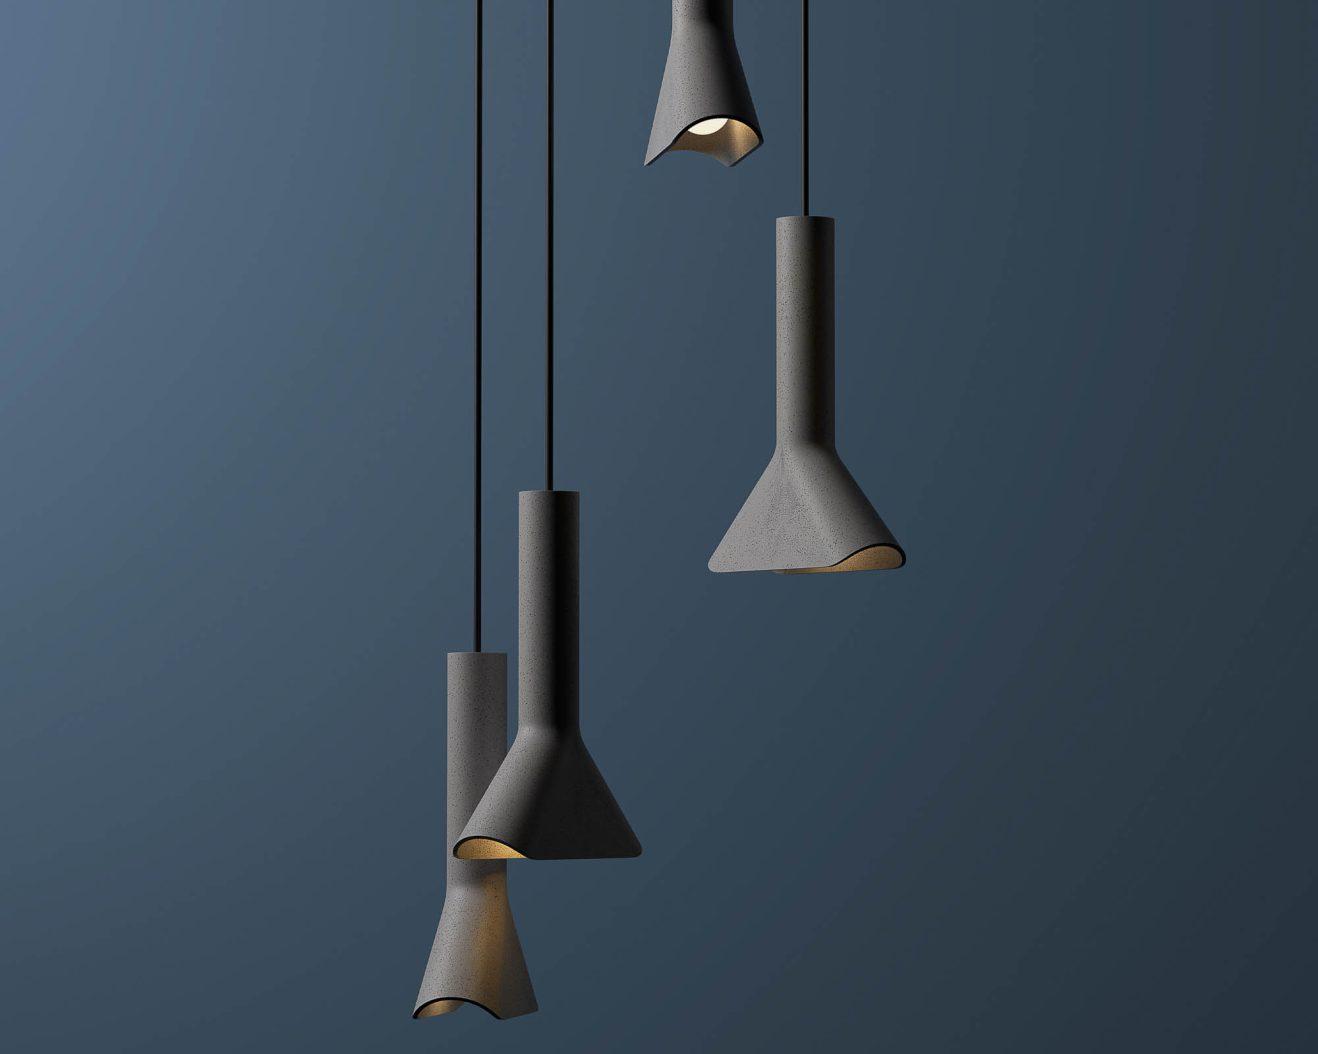 Ru-BentuDesign-pendantlamp2